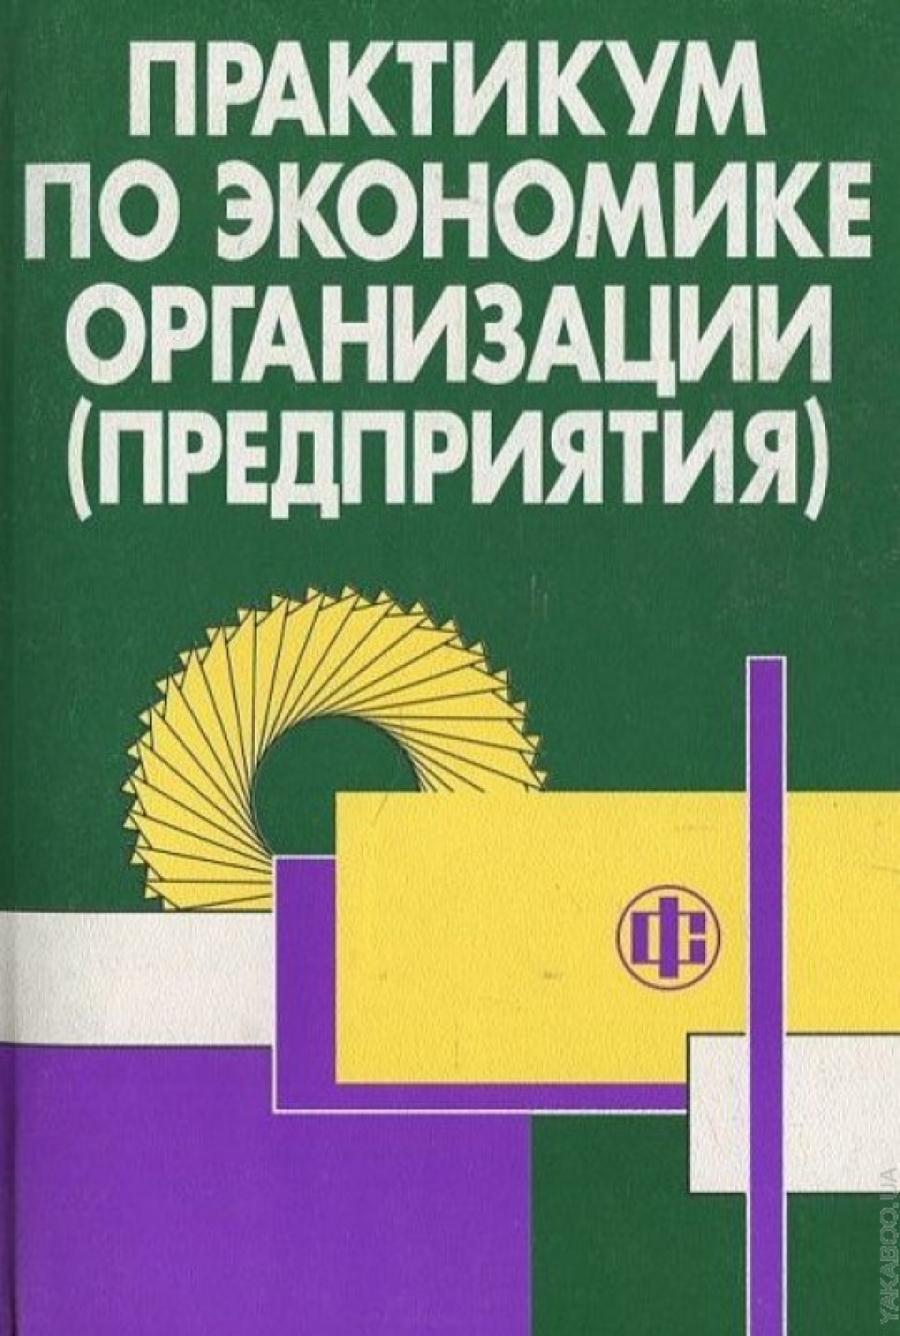 Обложка книги:  тальмина п.в., чернецова е.в. - практикум по экономике организации (предприятия)